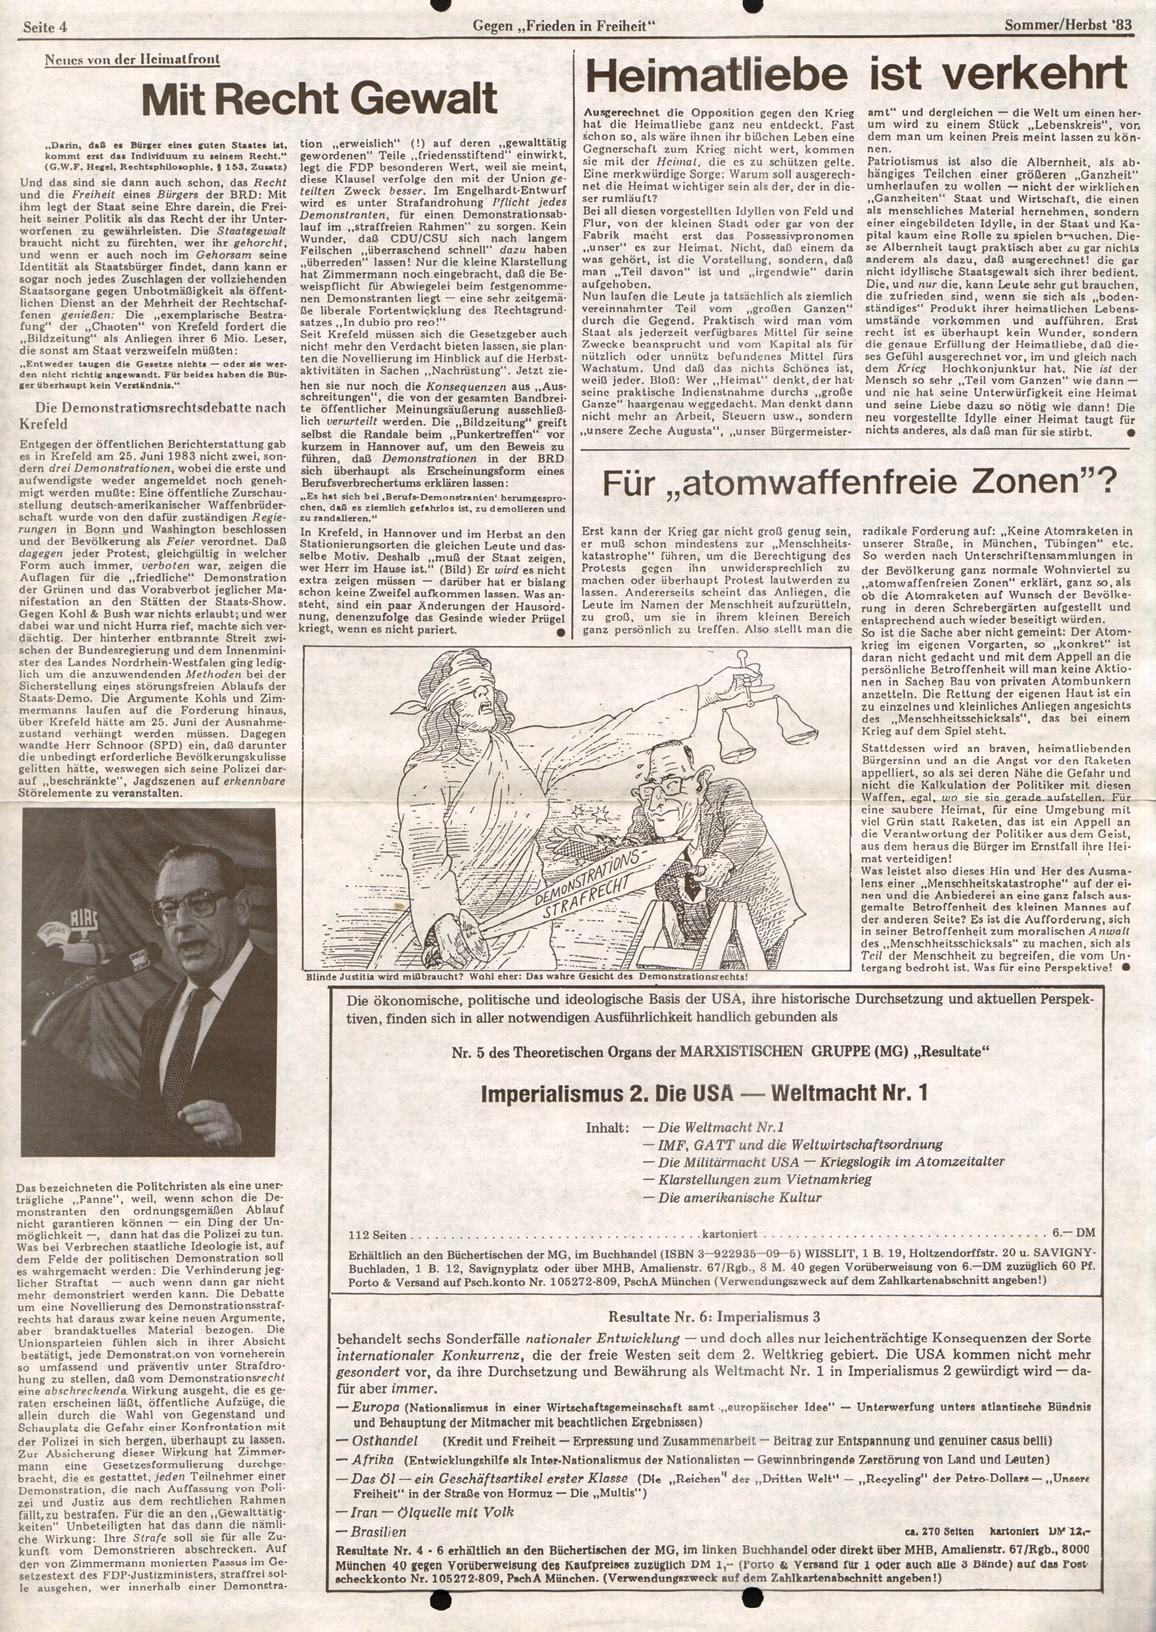 Berlin_MG_FB_19831000_04